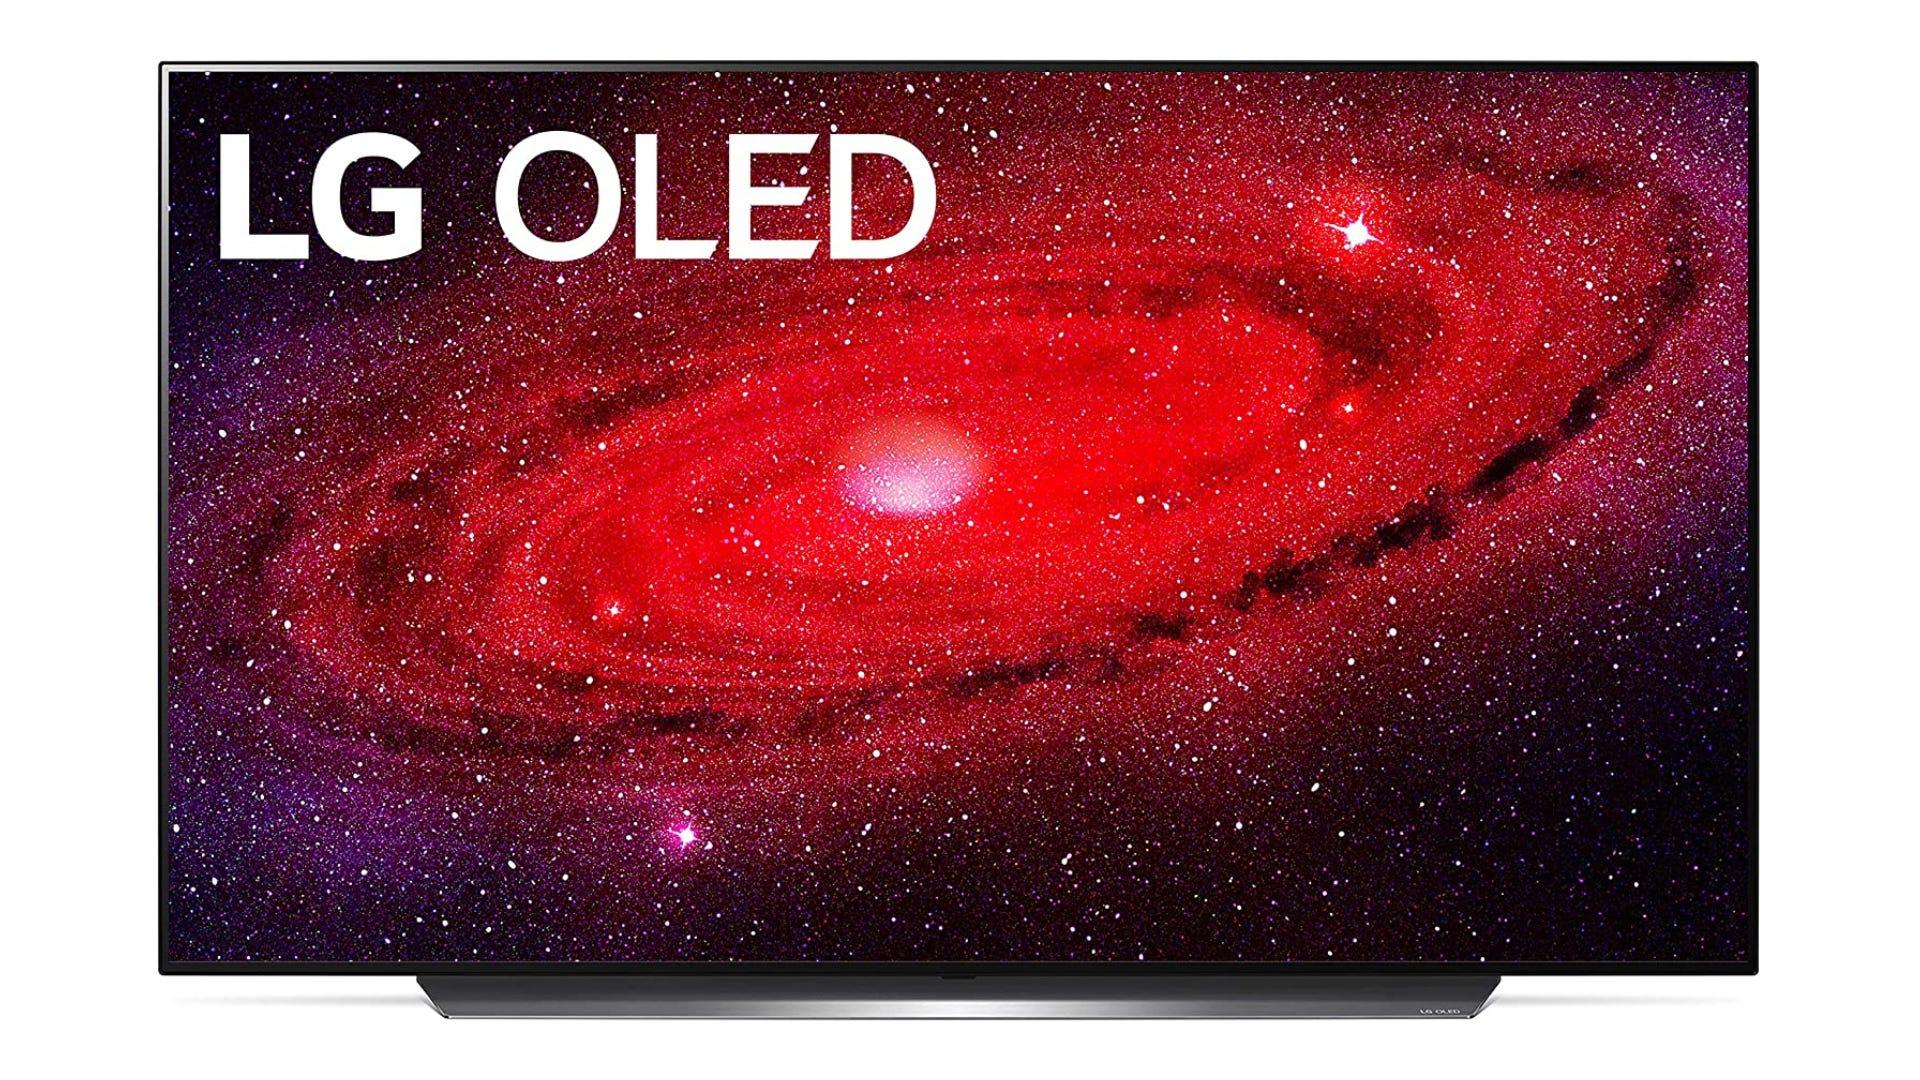 Render of LG CX OLED TV